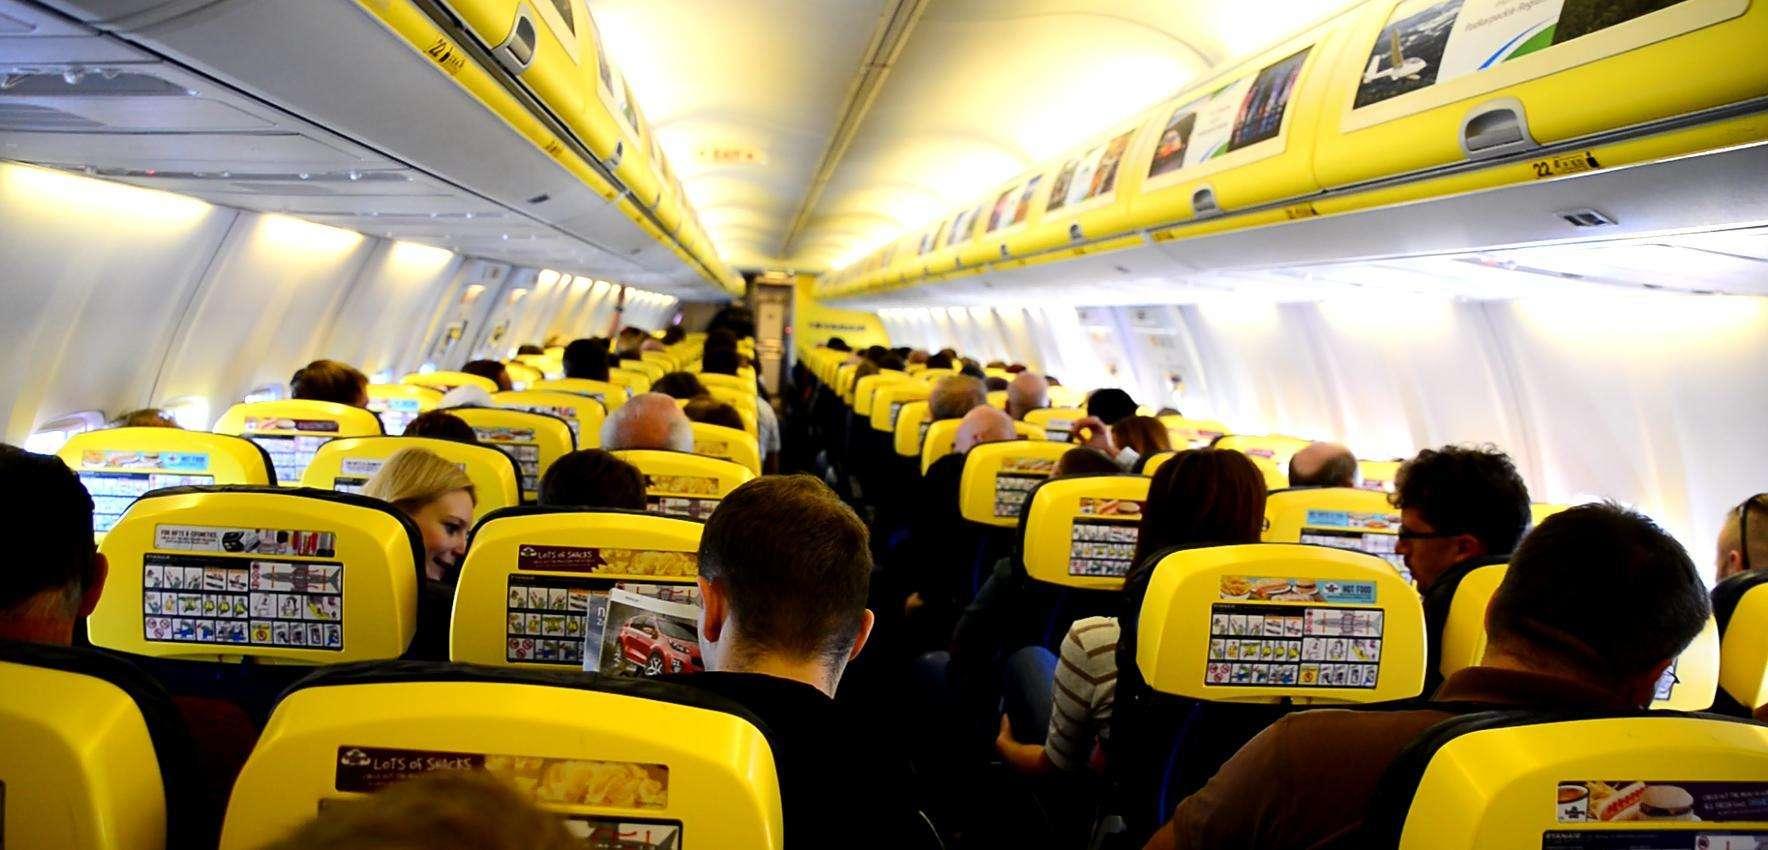 Ryanair z Katowic do Chanii (Kreta)